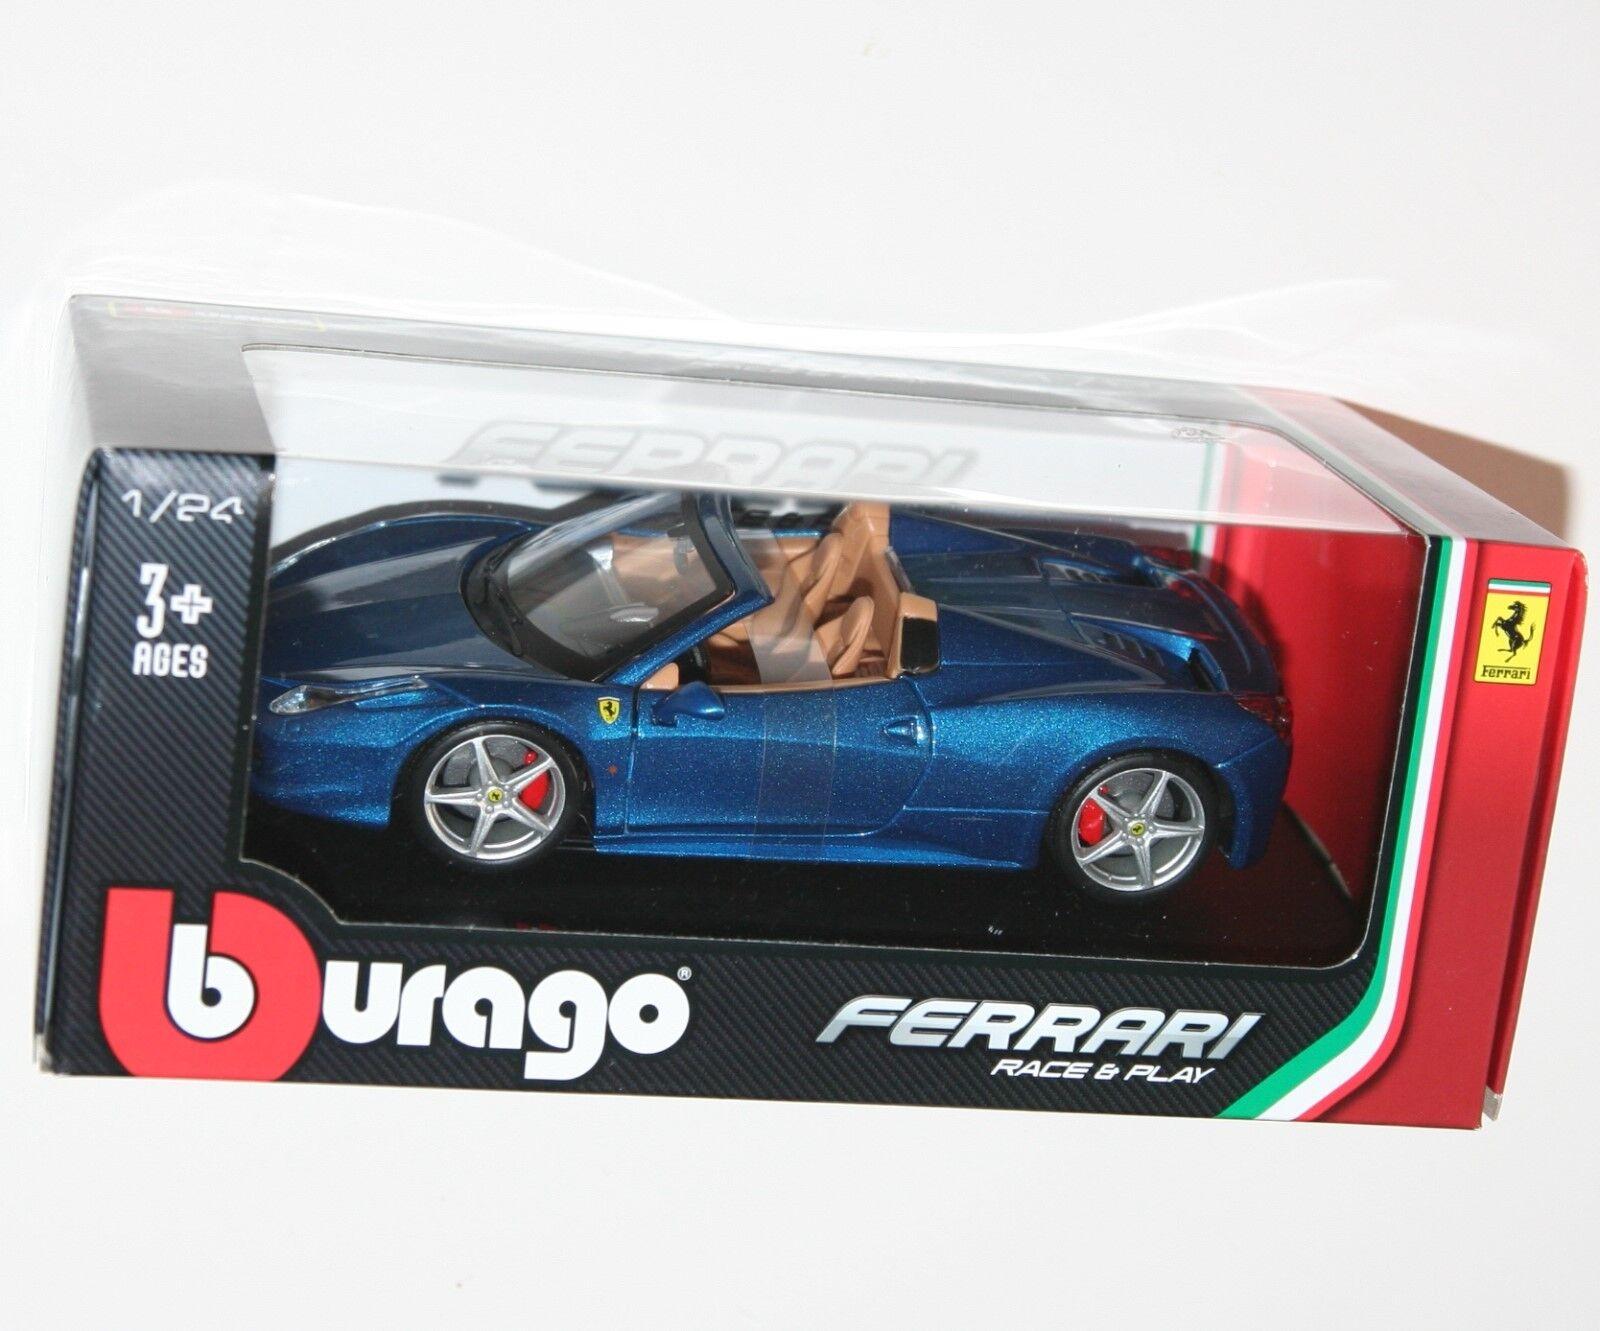 Burago - FERRARI 458 SPIDER (bluee) - Die Cast Model - Scale 1 24